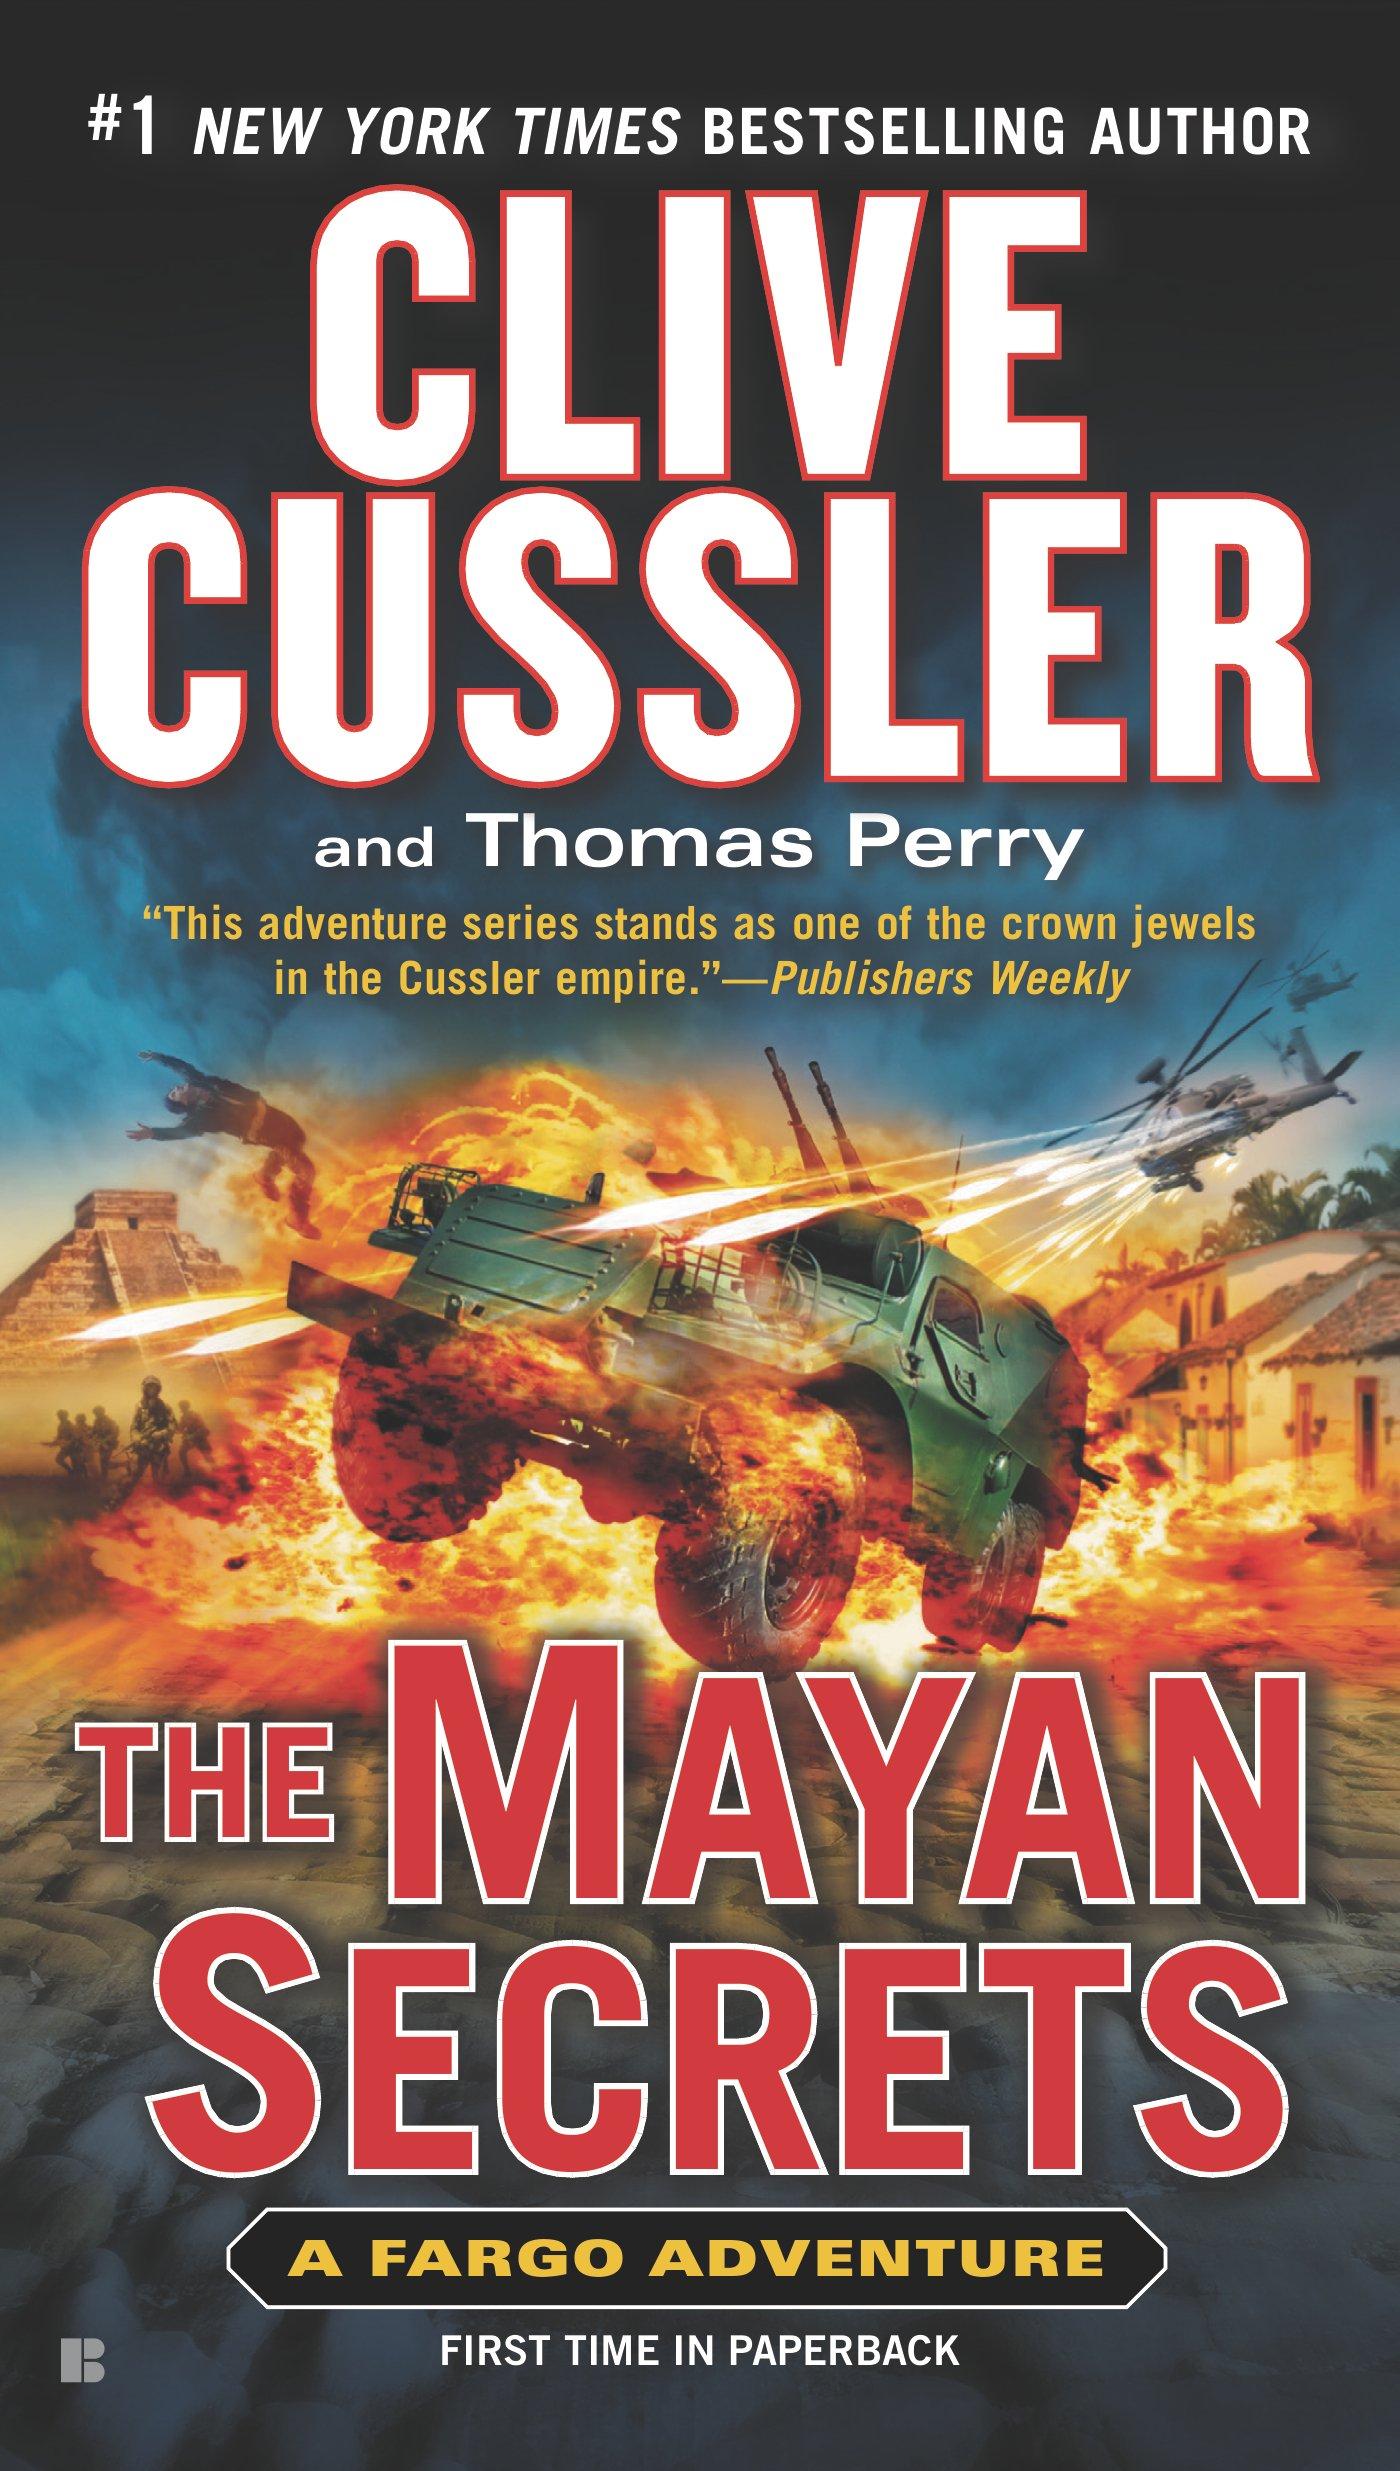 The Mayan Secrets (A Fargo Adventure)  - Clive Cussler,Thomas Perry